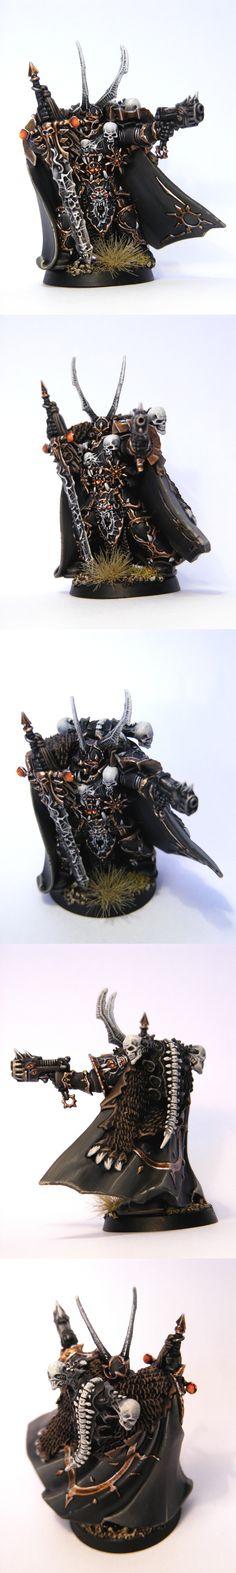 Chaos Black Legion Lord Kranon the Relentless